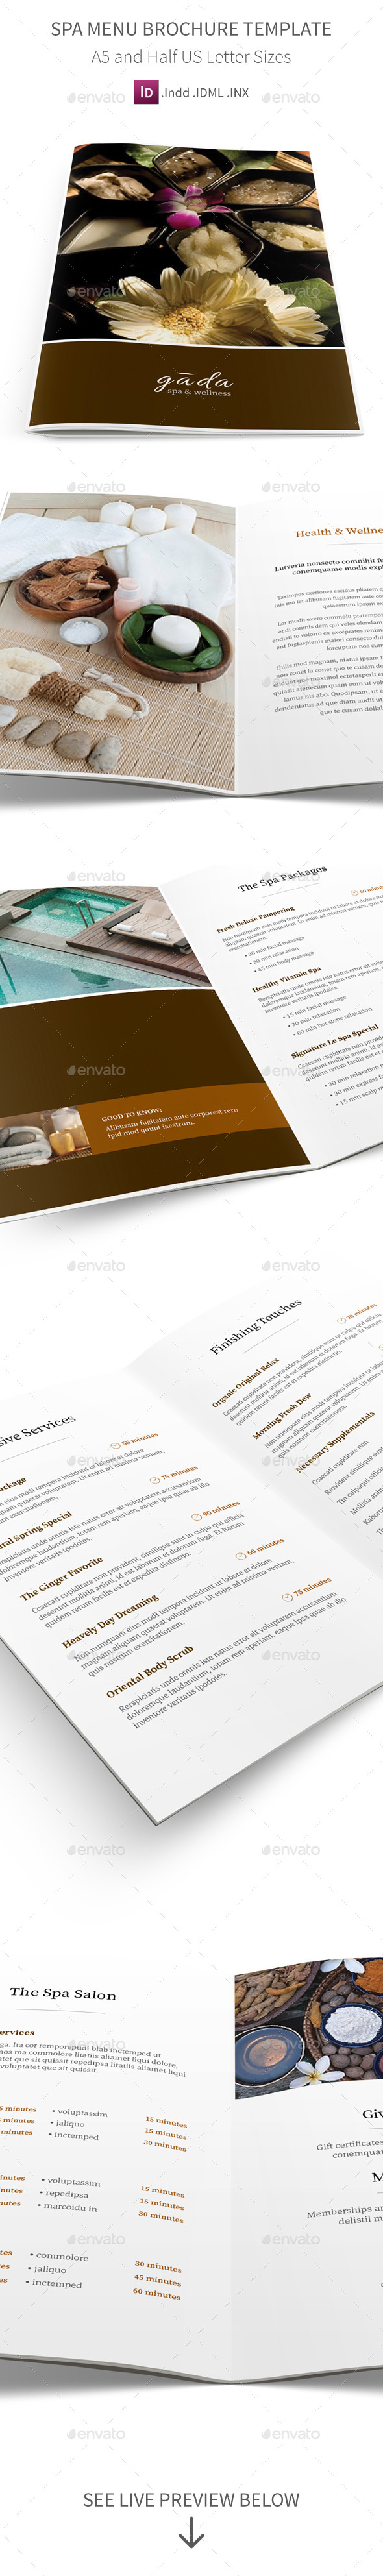 Spa Menu Brochure A5 Half Letter Sizes